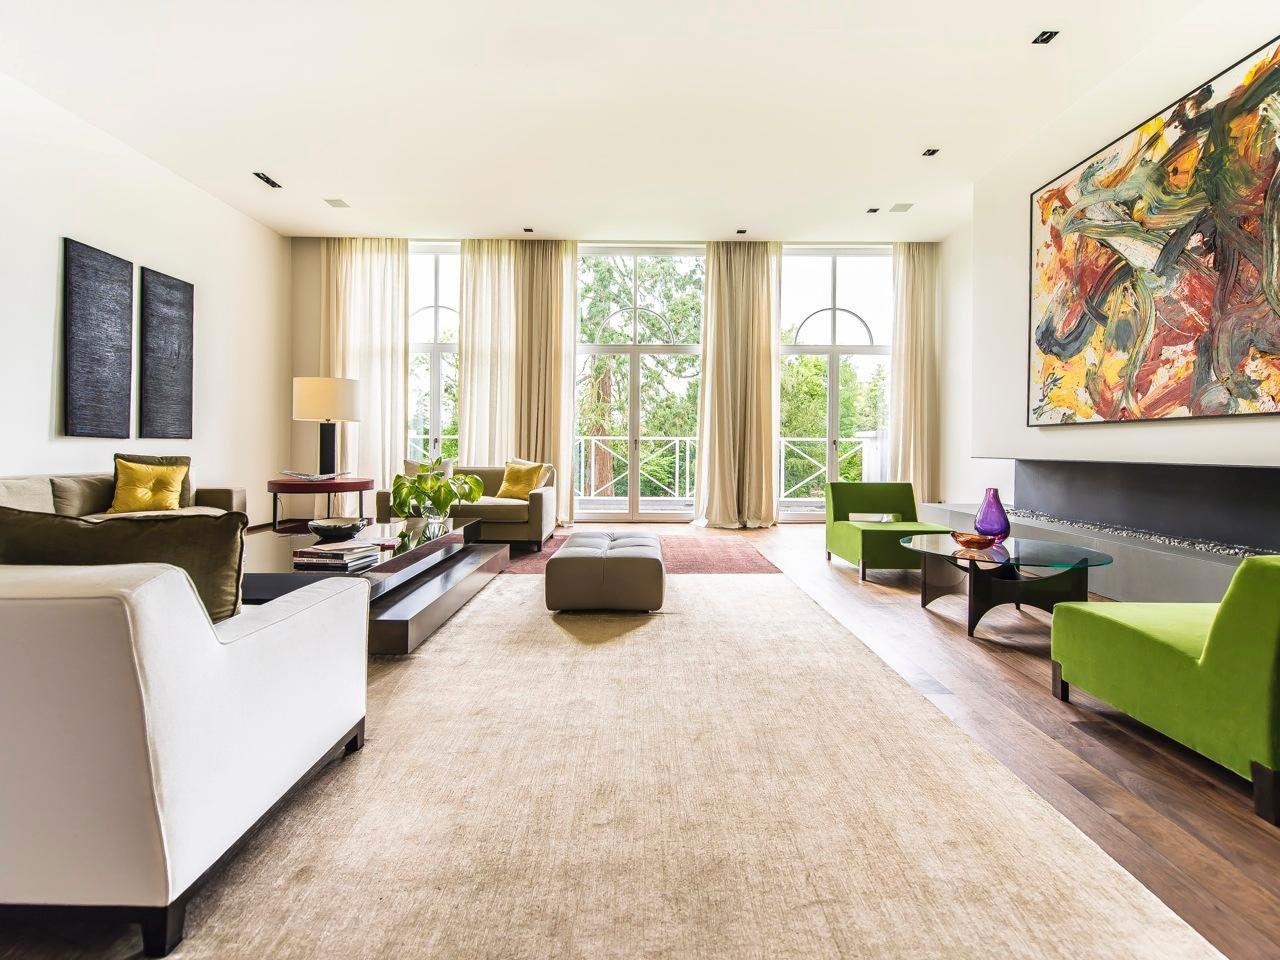 Chic Elegant Apartment in Brussels With Bright Interiors-08